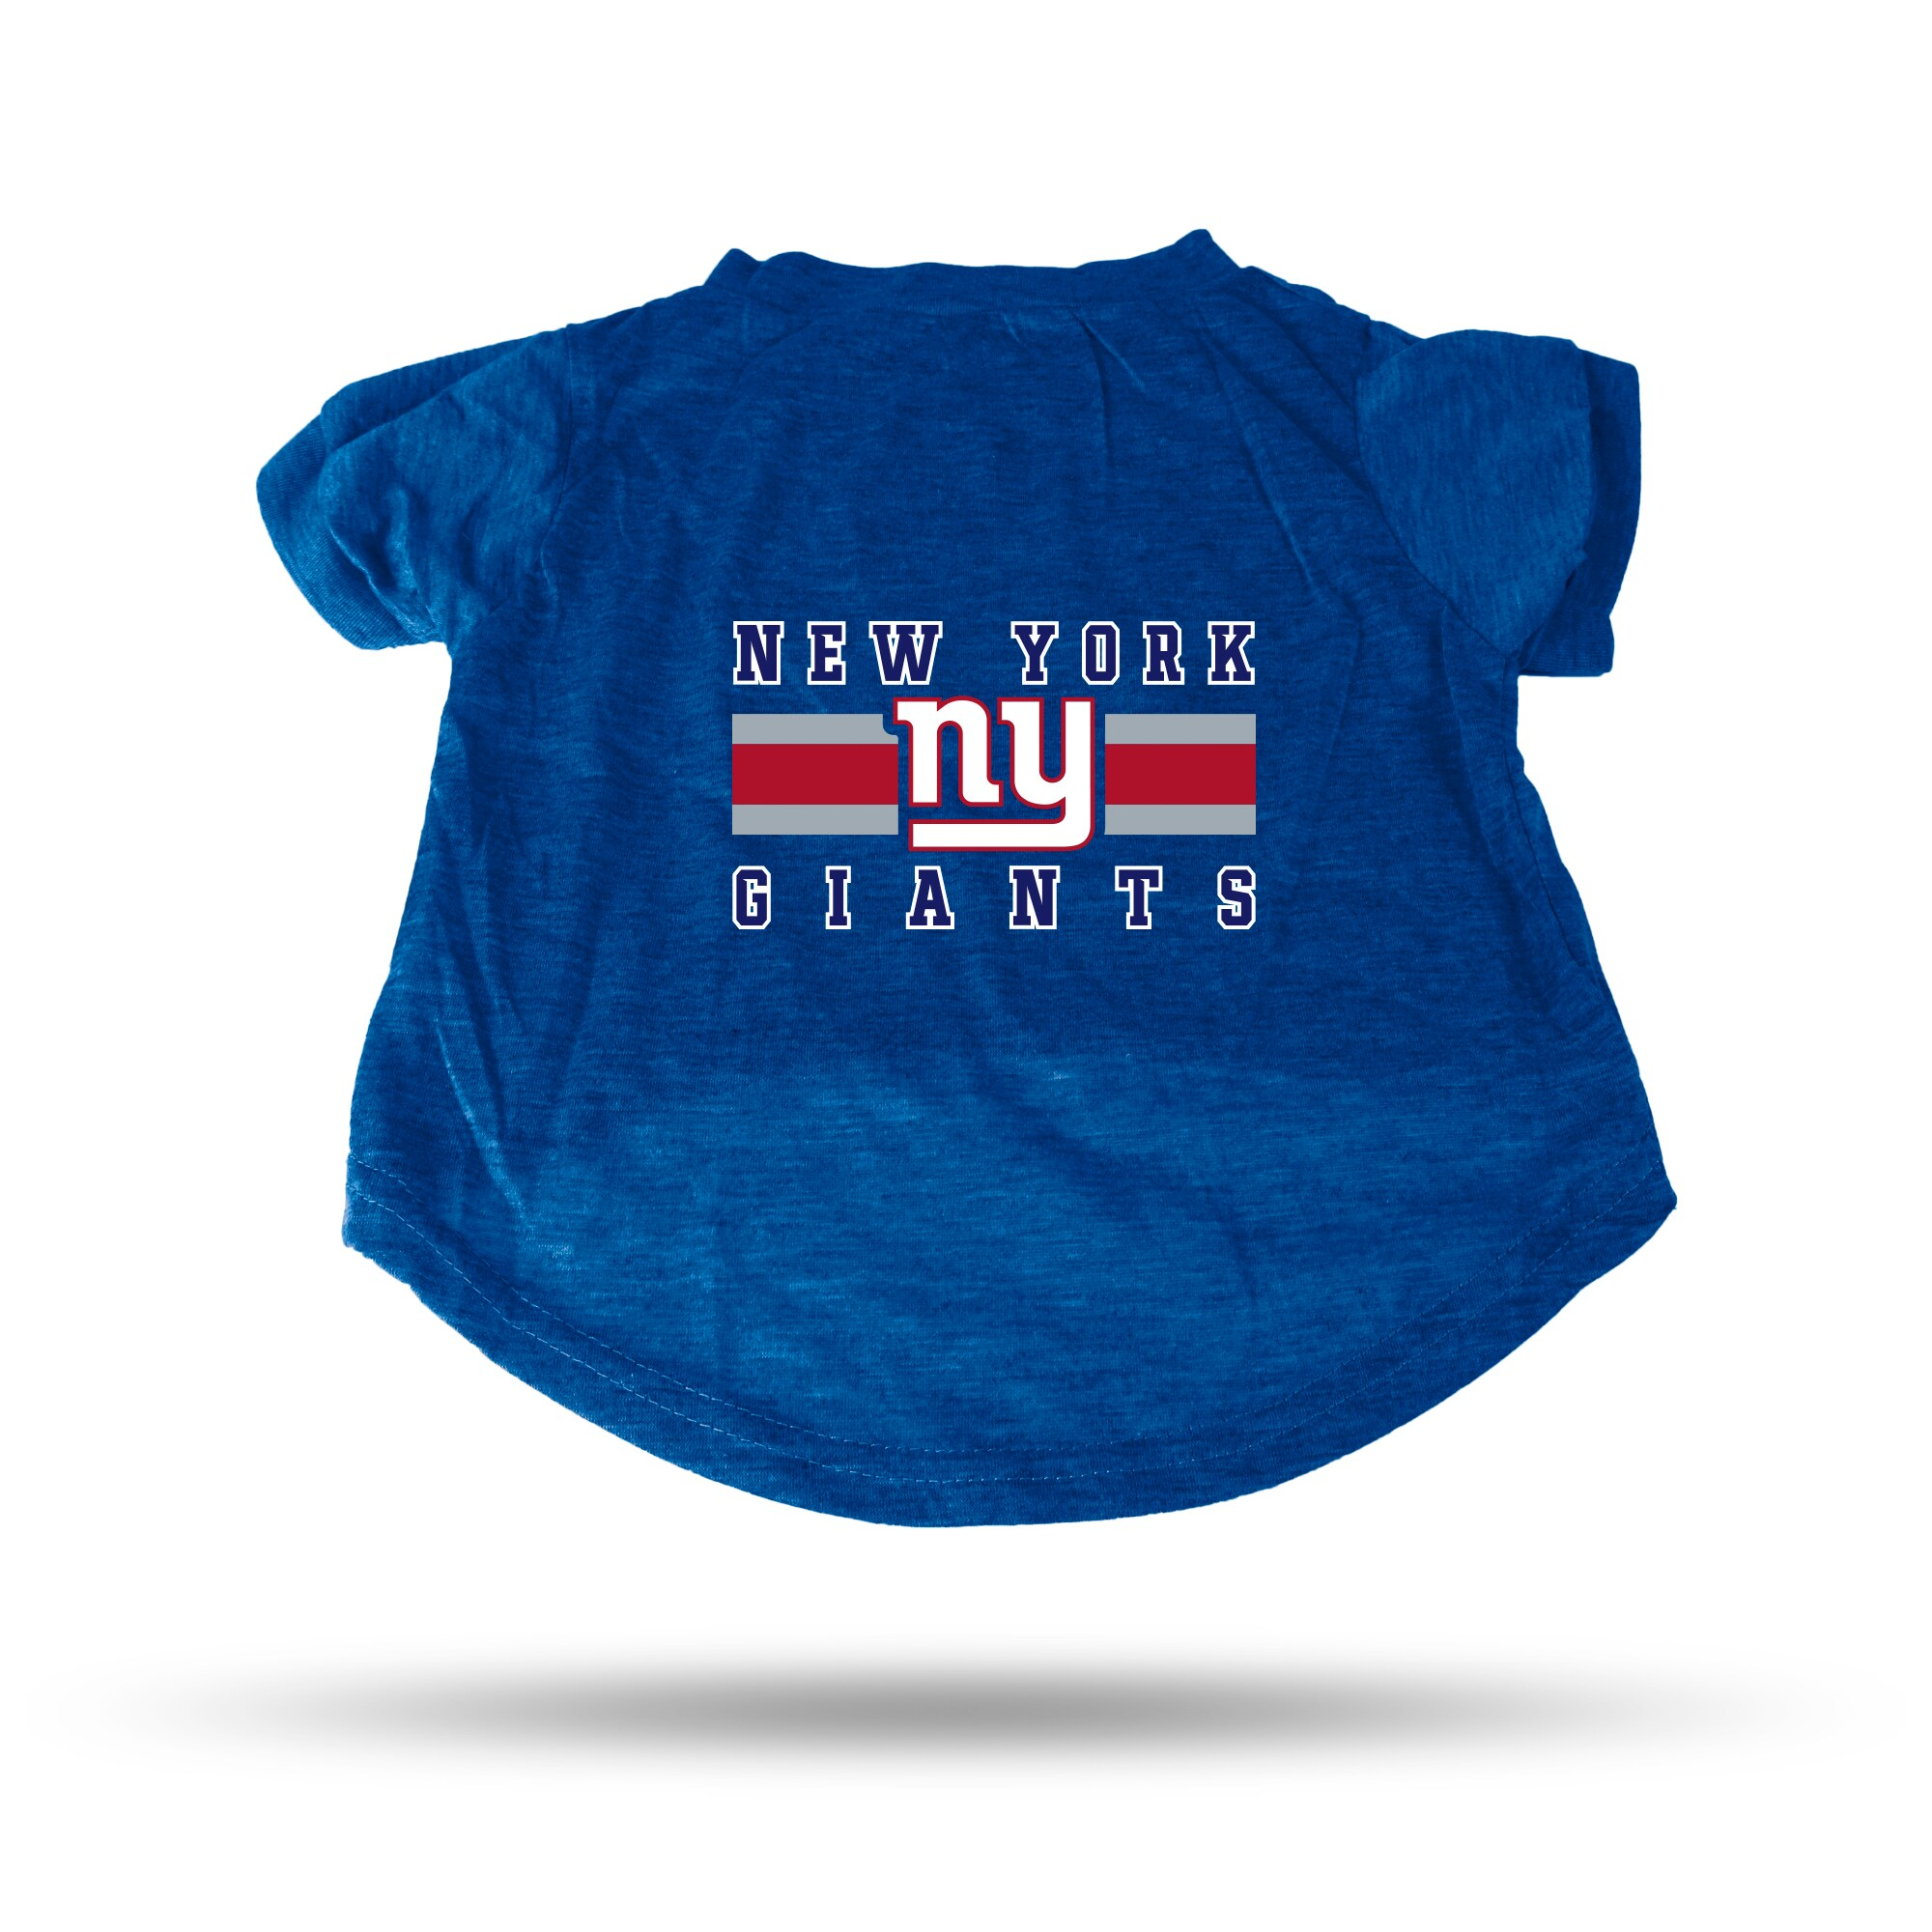 New York Giants Sparo Pet T-Shirt - Blue